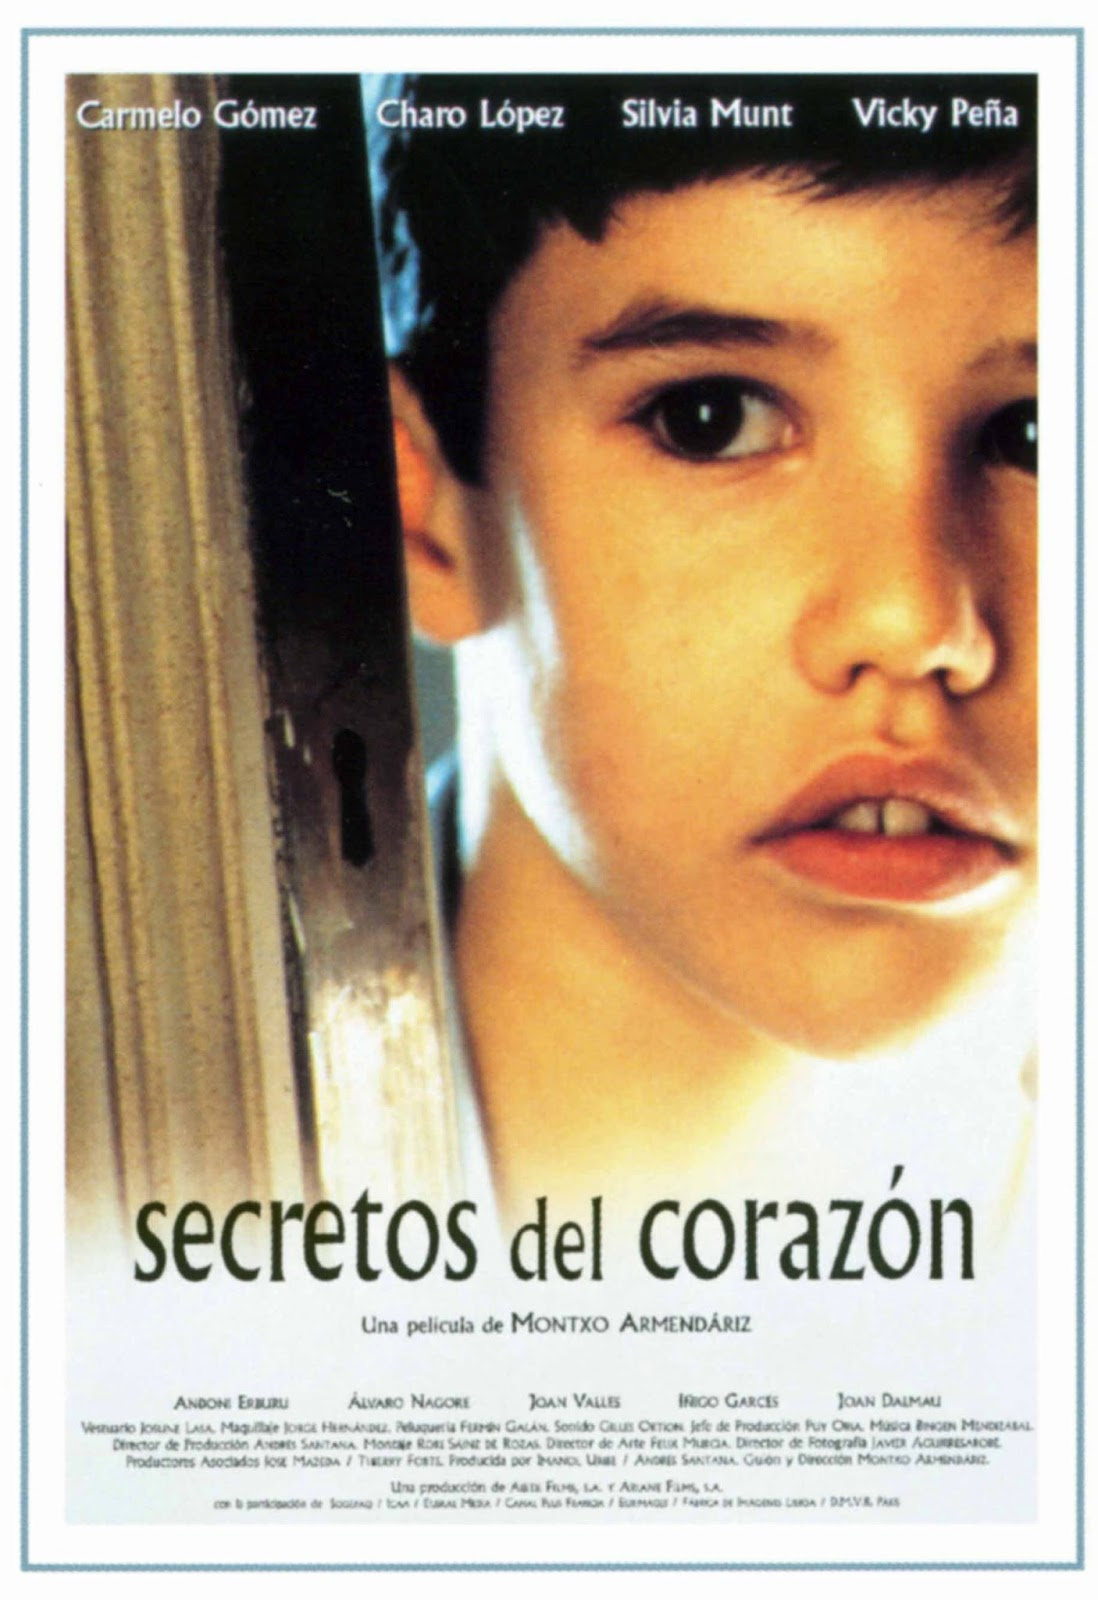 Secretos del corazon (1997) ταινιες online seires oipeirates greek subs